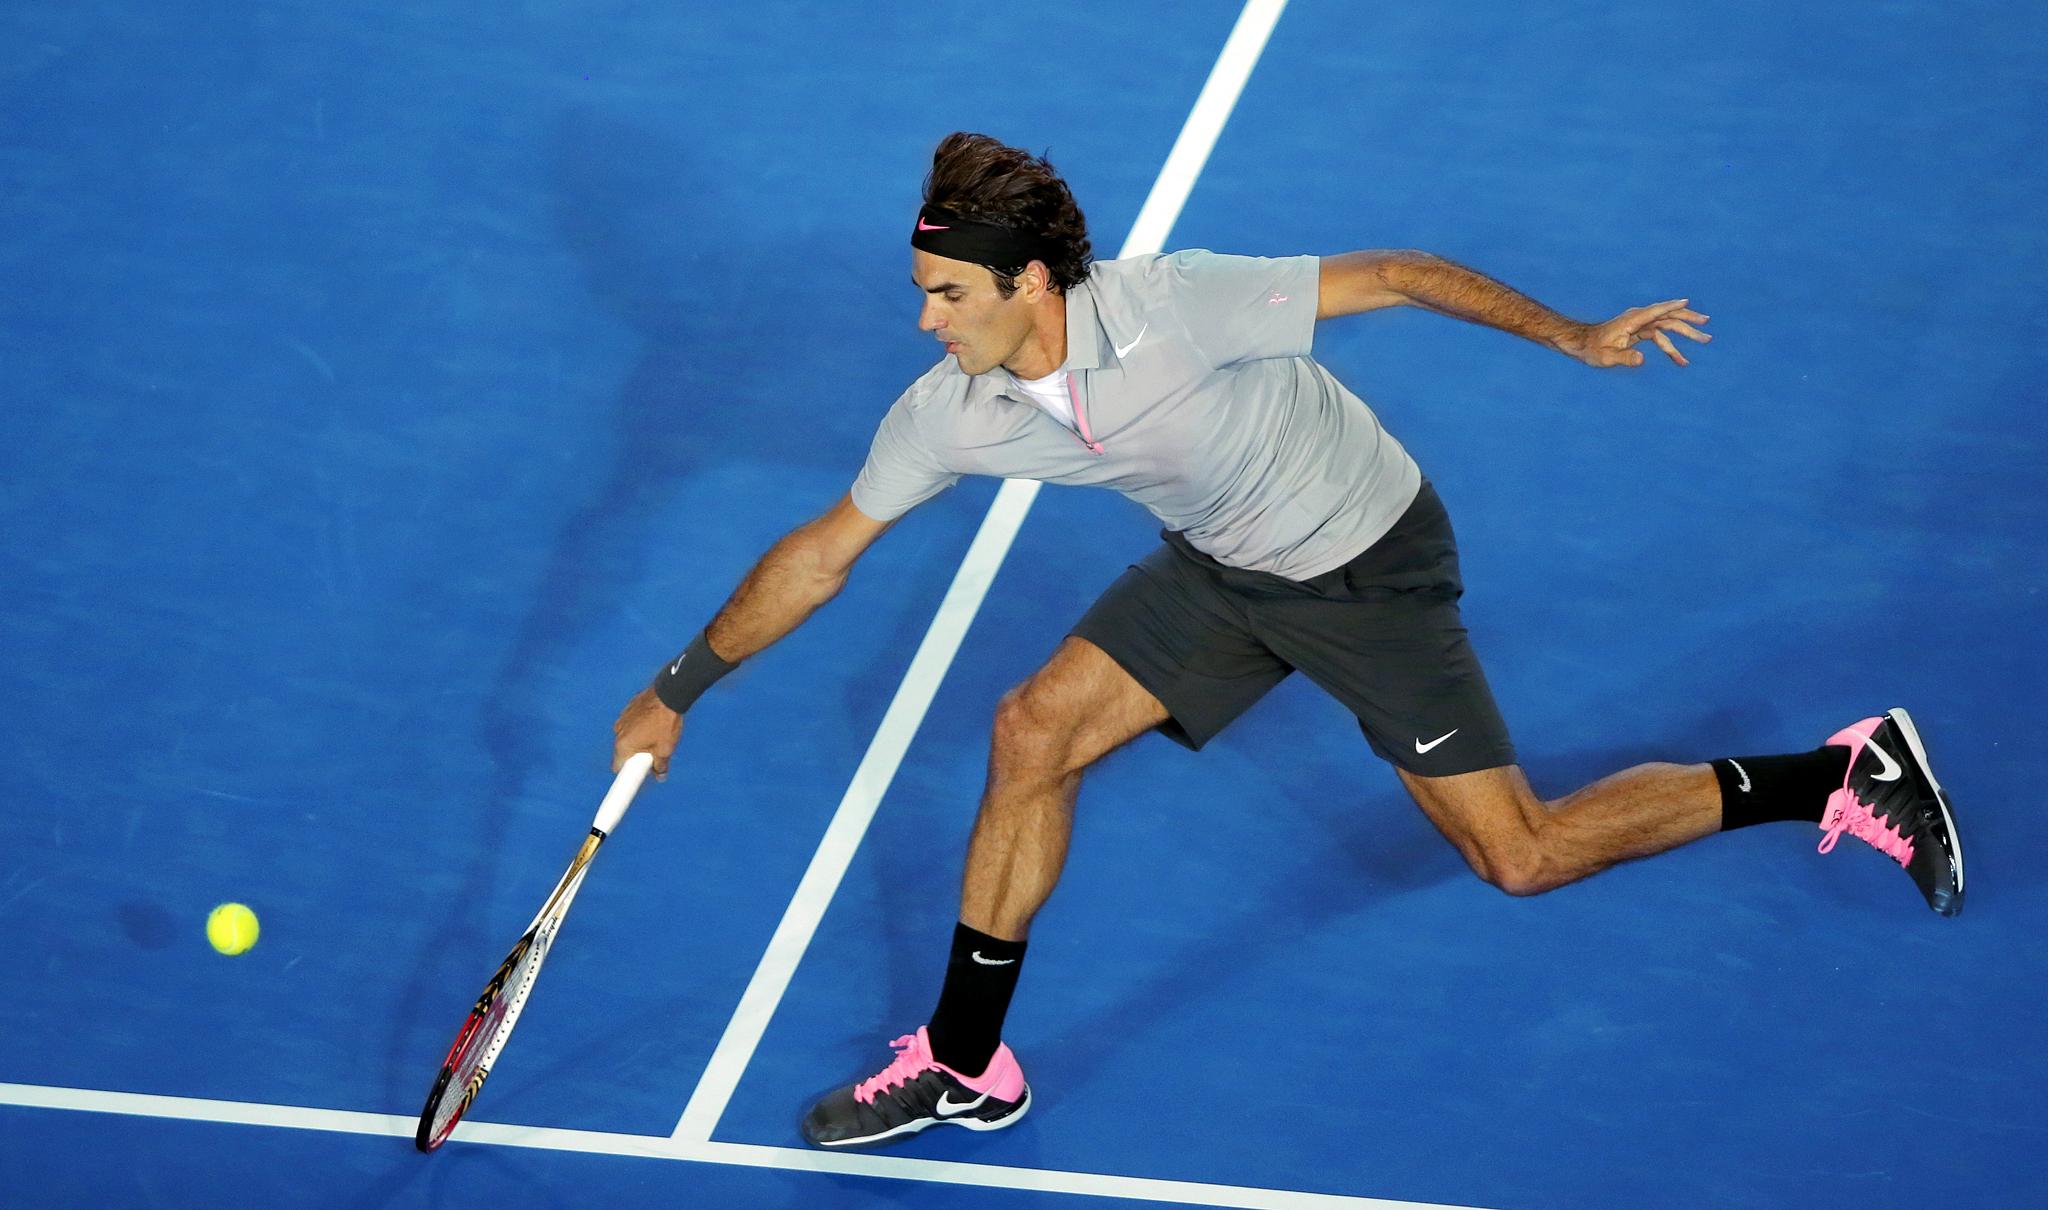 One Last Step - 2013 Australian Open - ESPN